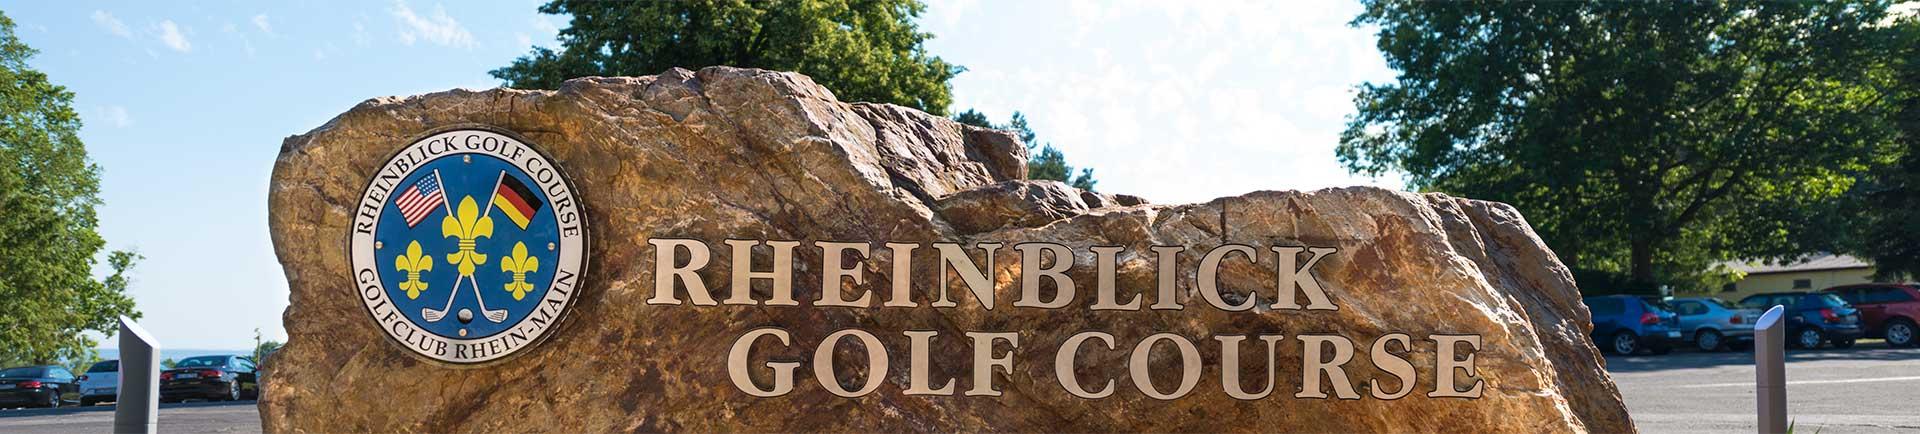 rheinblick-golfcourse-1